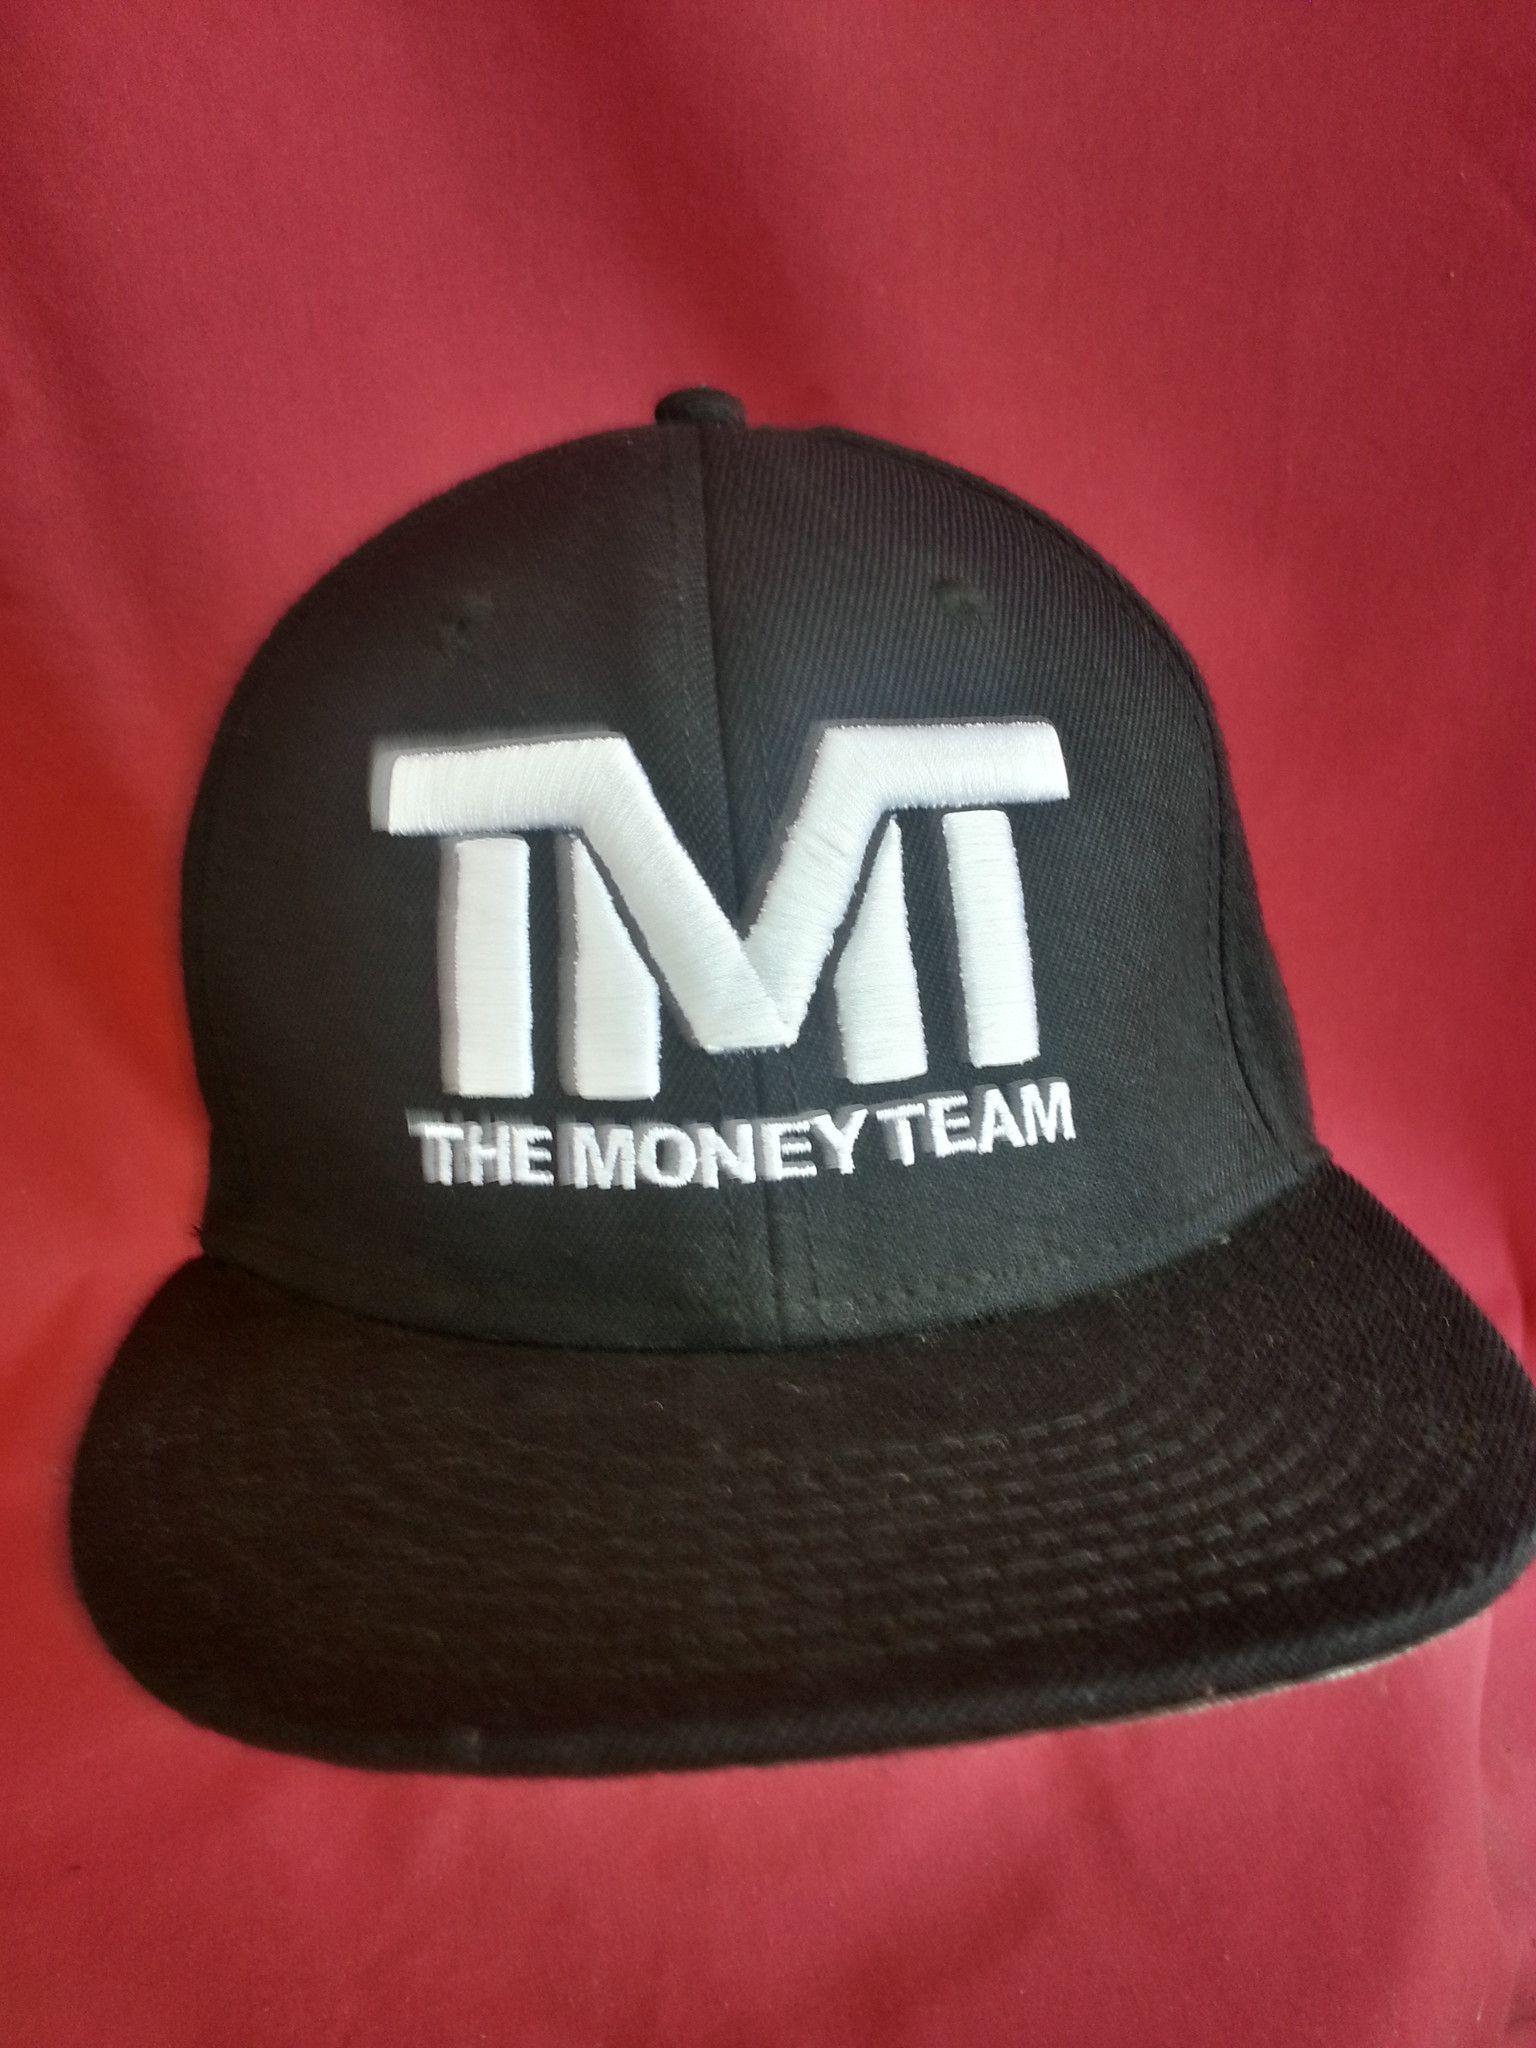 Floyd Mayweather The Money Team Snapback Hat  73d19dba69f3